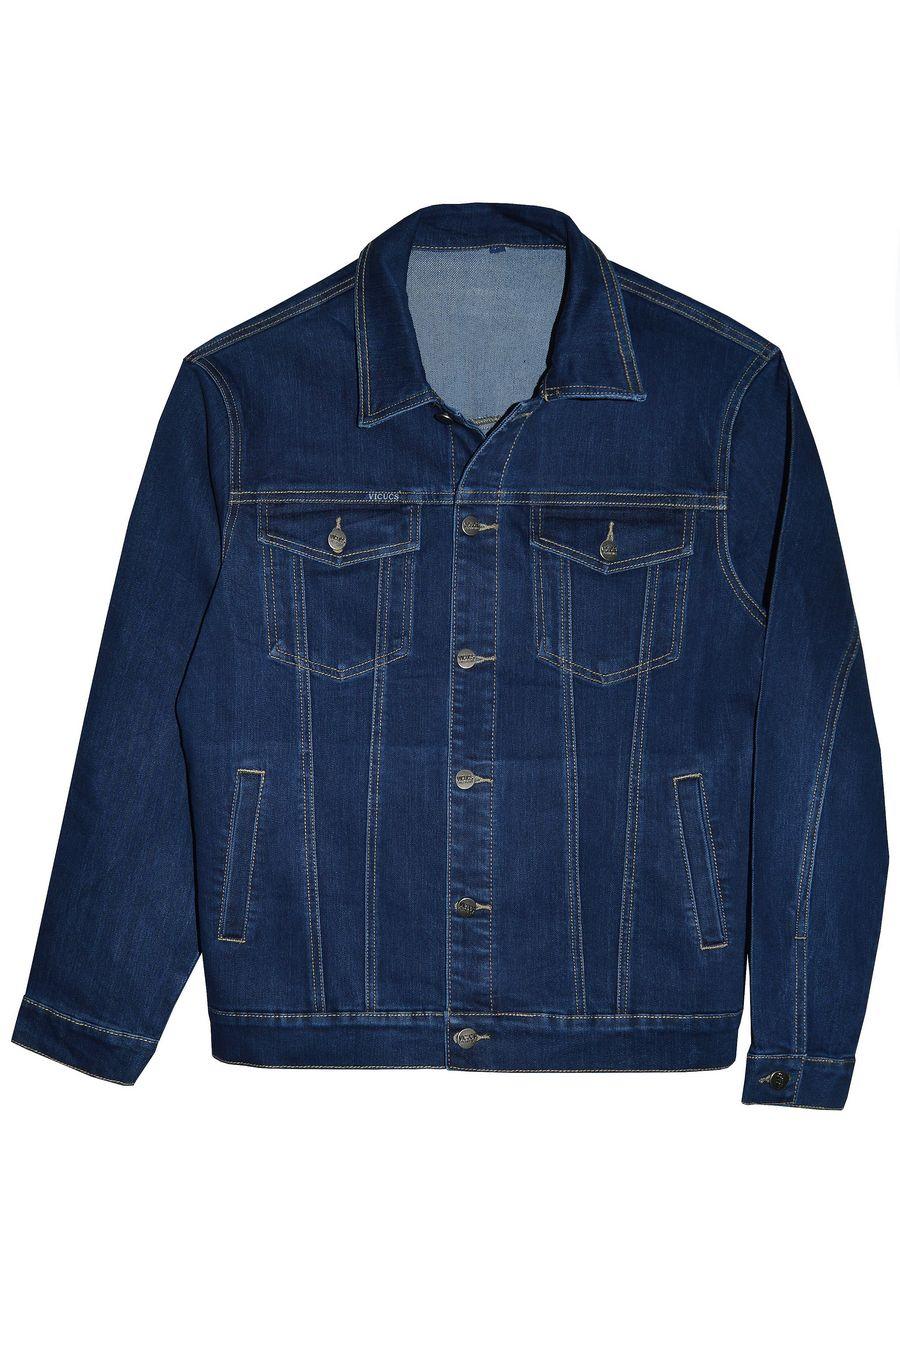 Пиджак мужской (джинсовка) Vicucs 728E.870-5 (XL-5XL) - фото 1